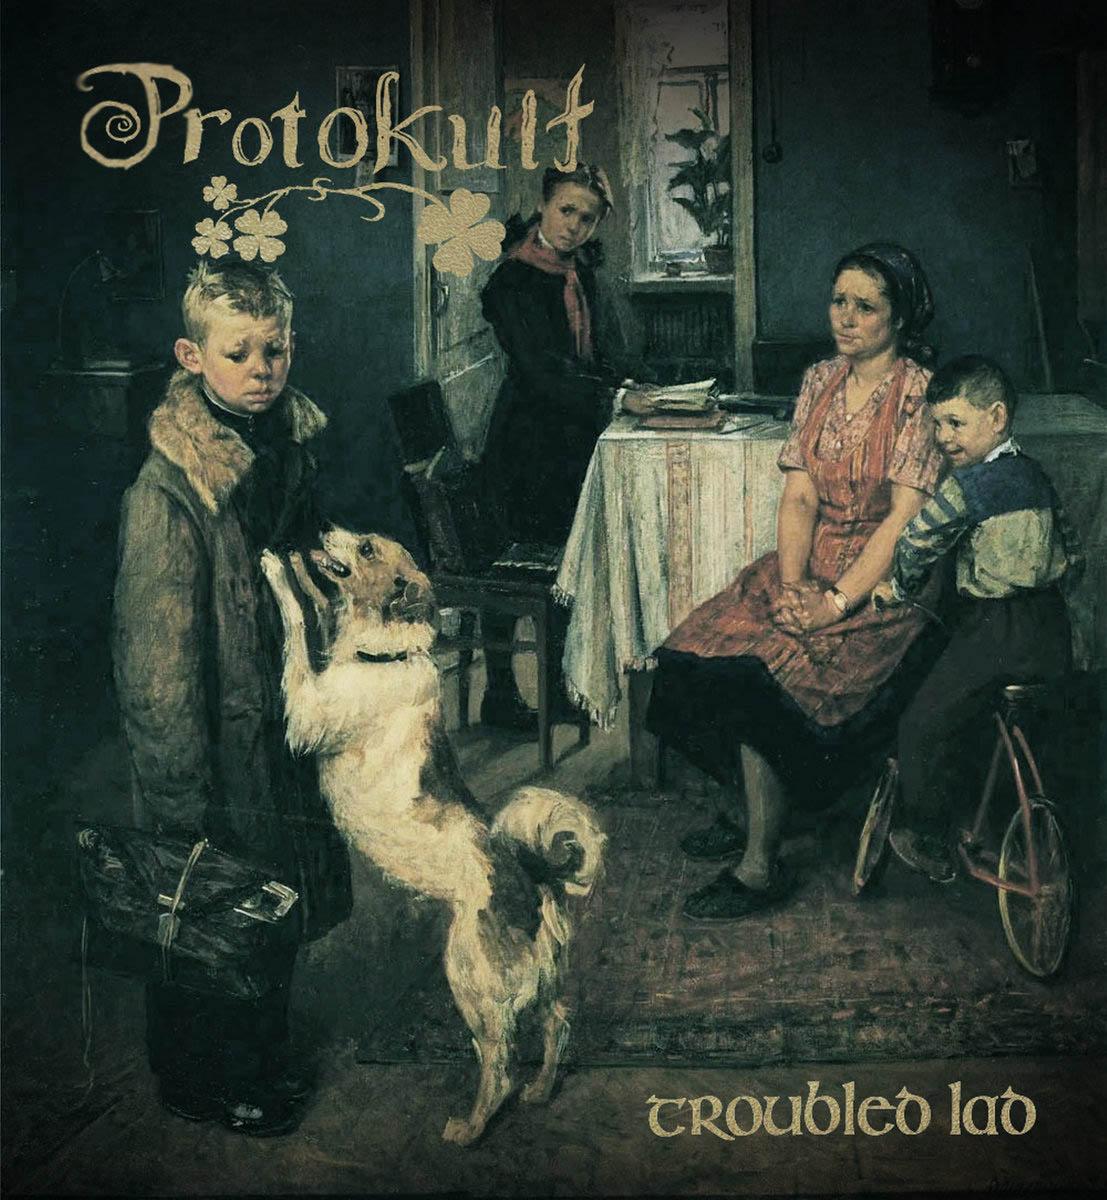 Protokult - Troubled Lad